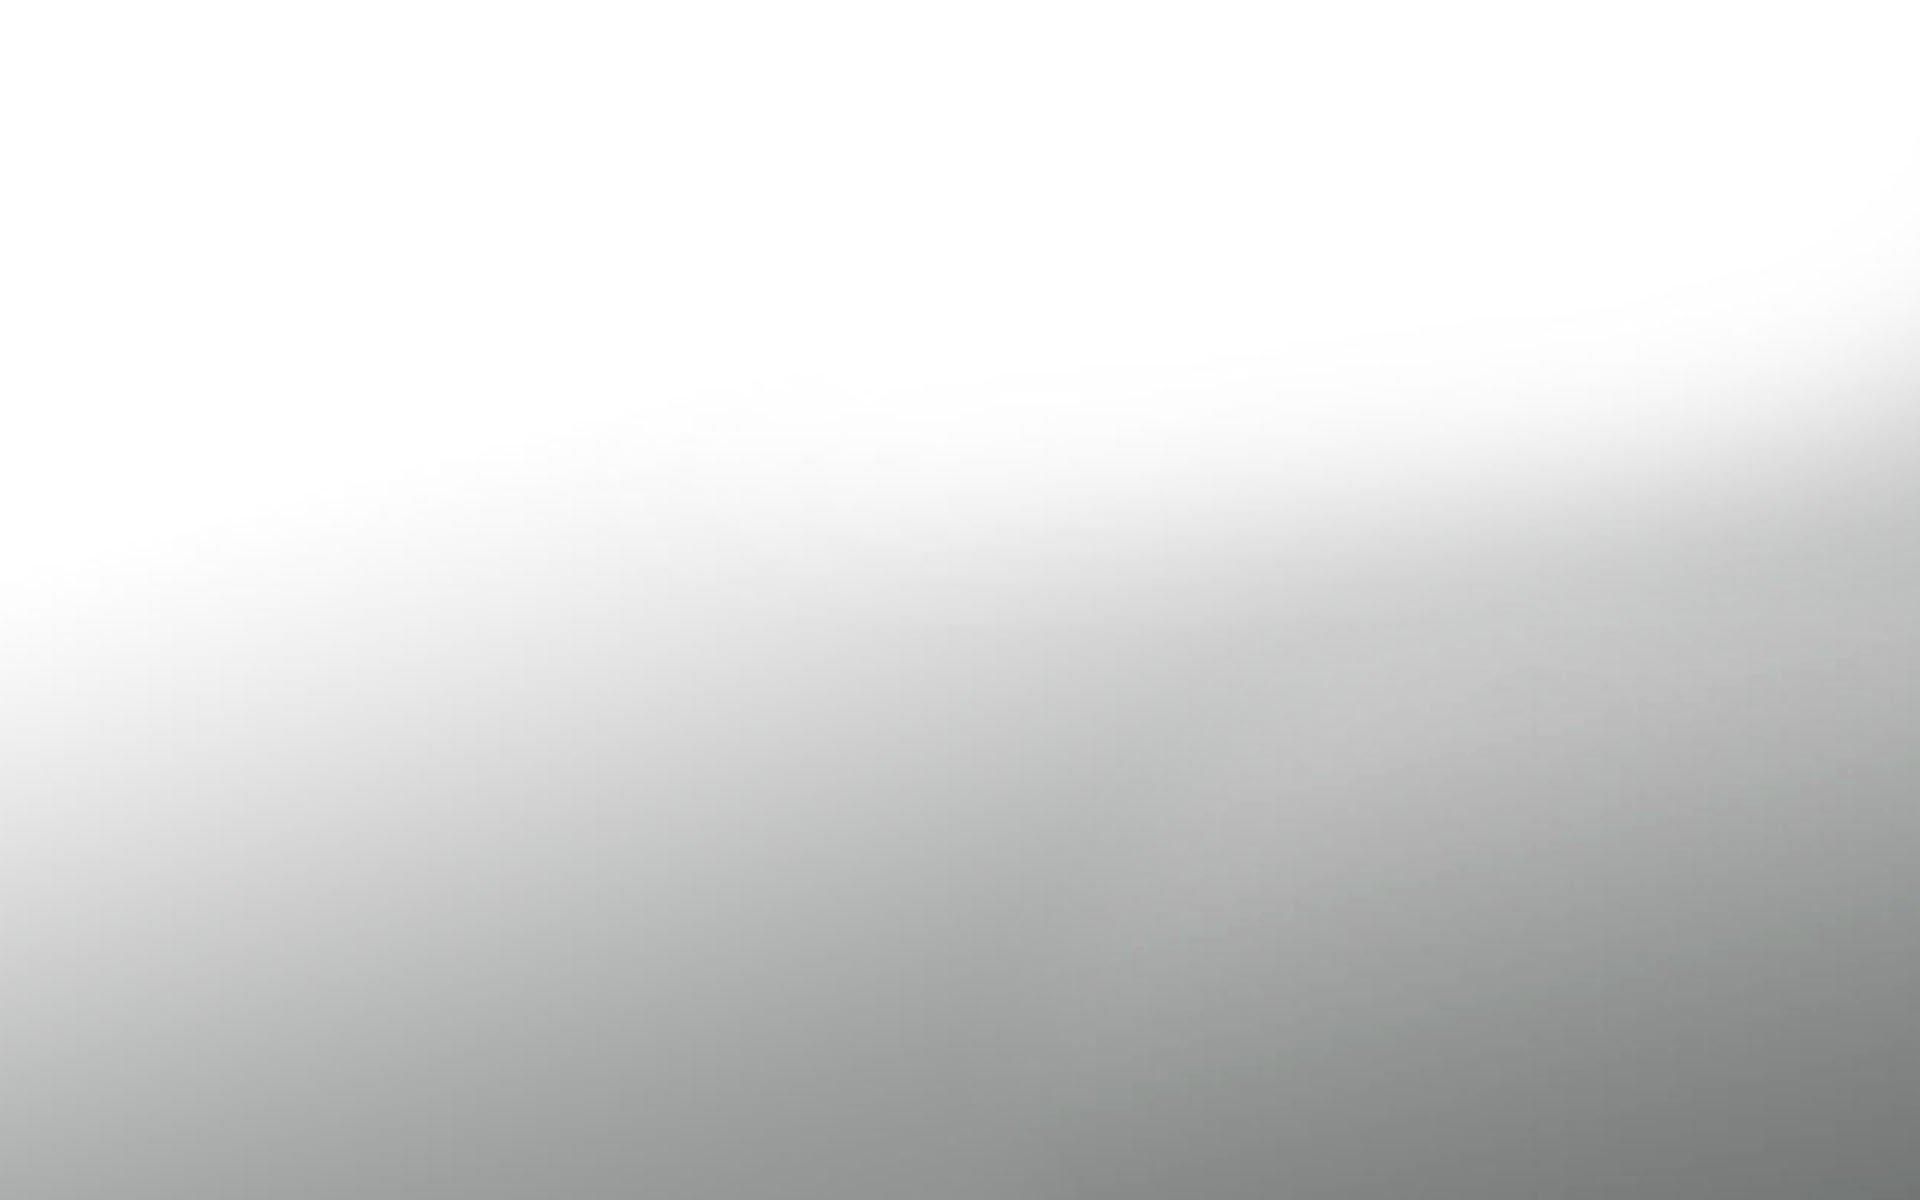 white gradient background - walldevil